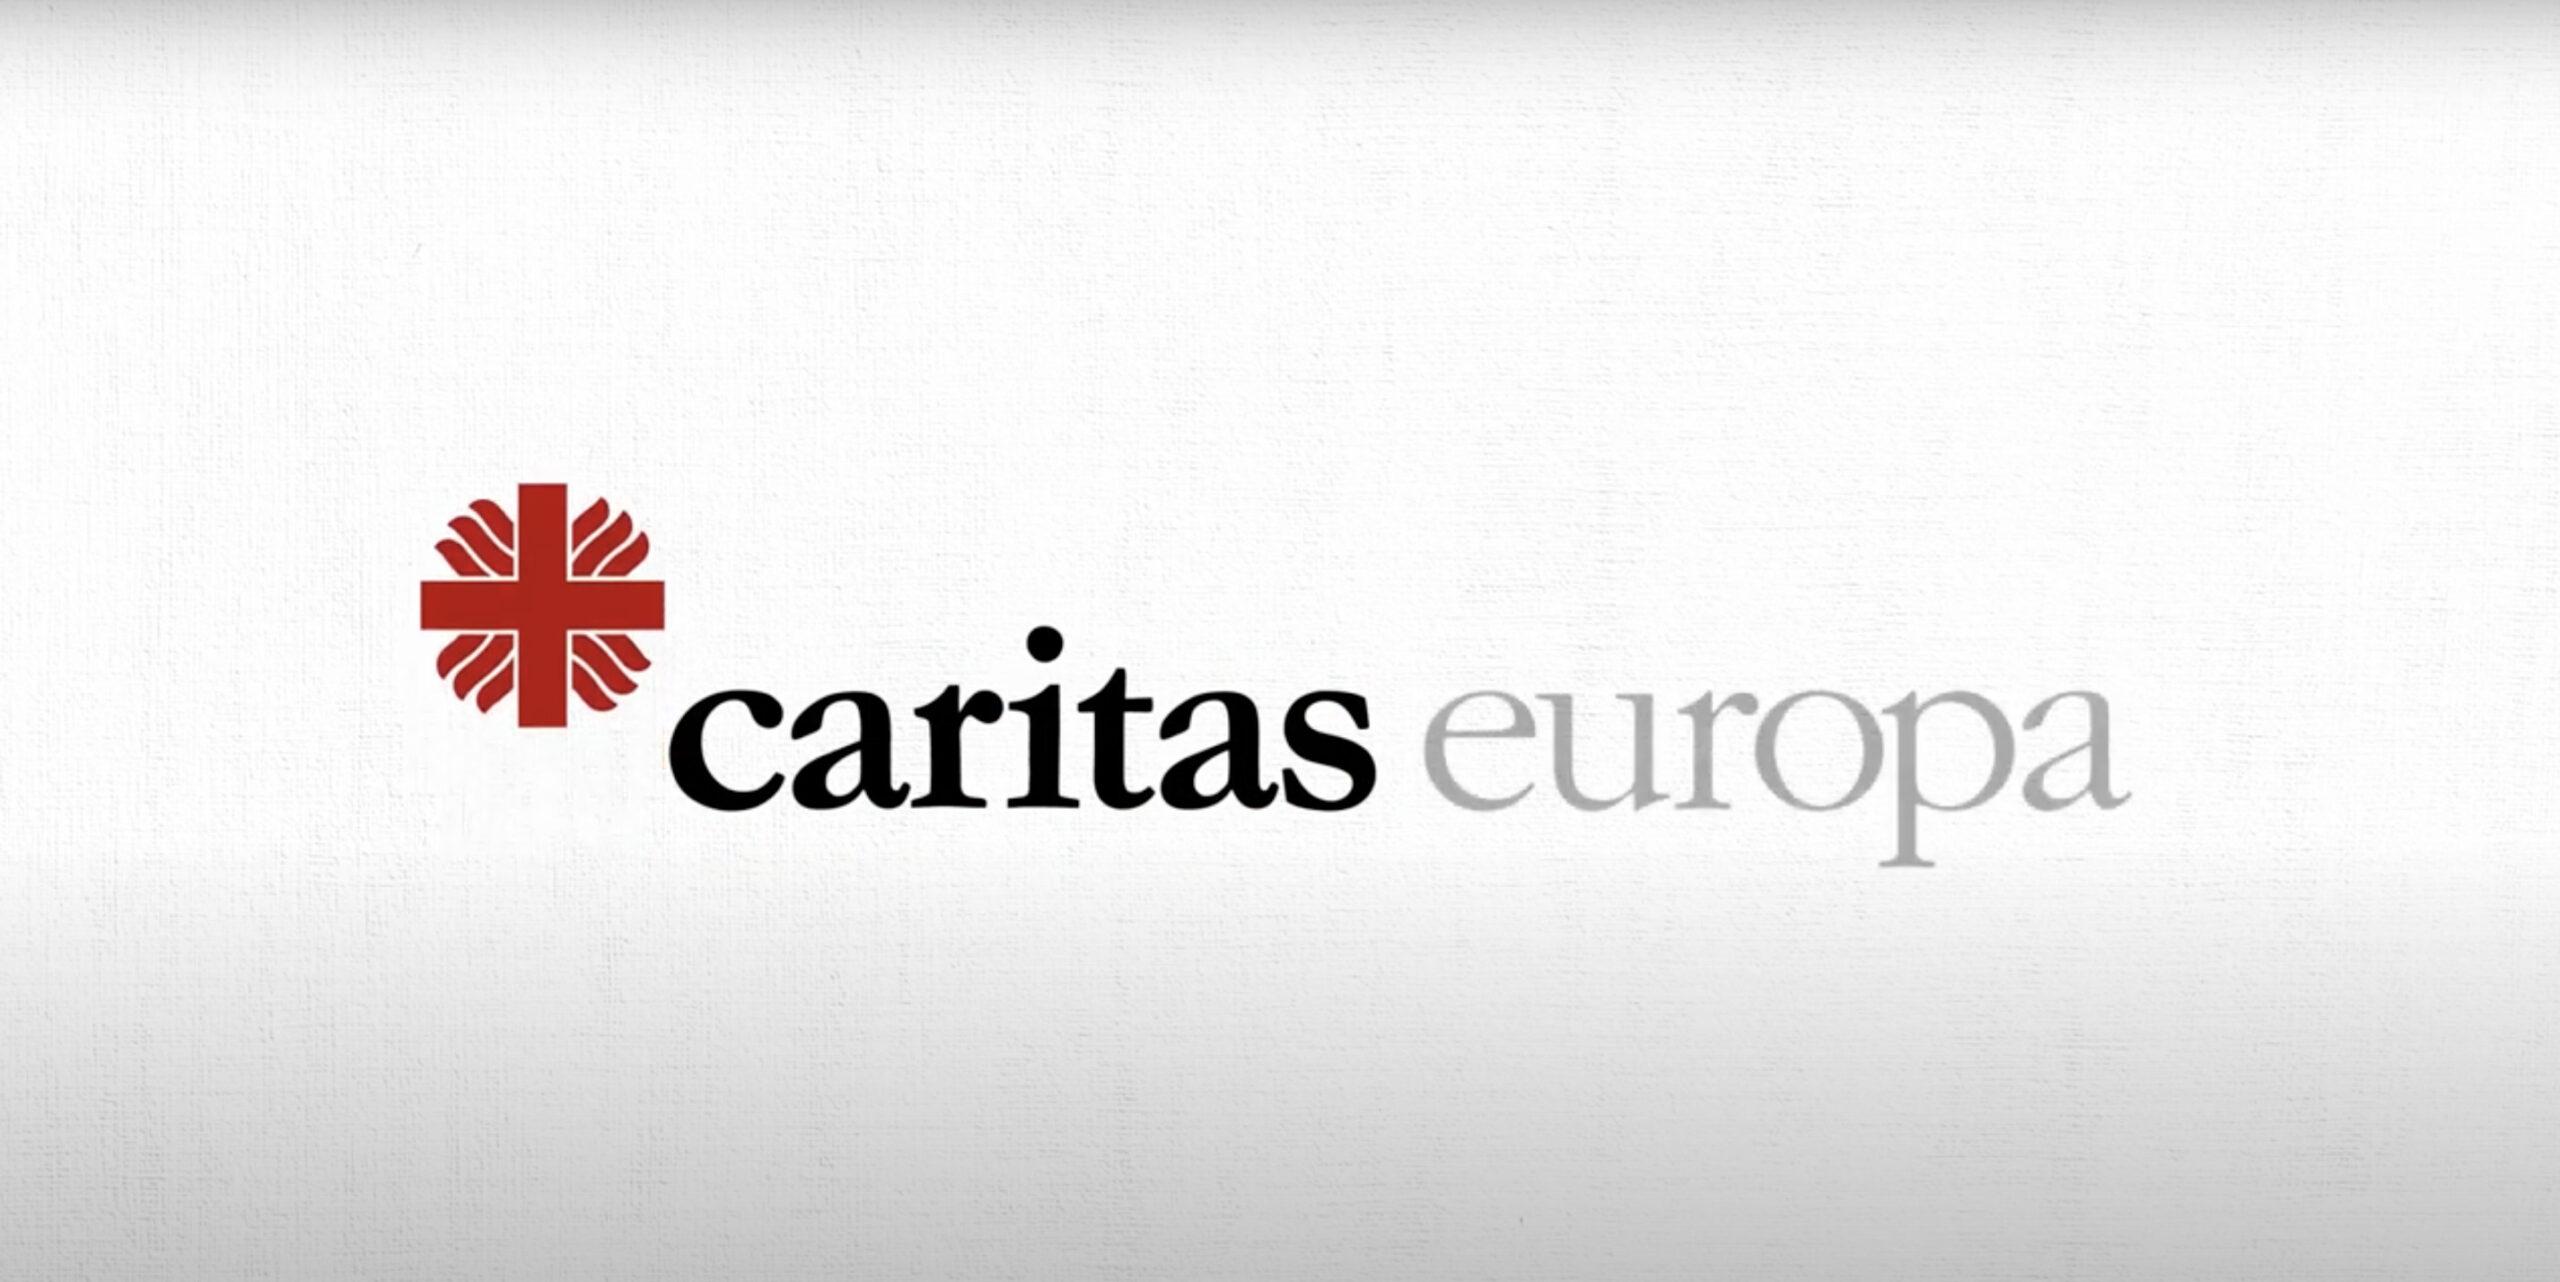 Caritas Europa: cos'è e di cosa si occupa